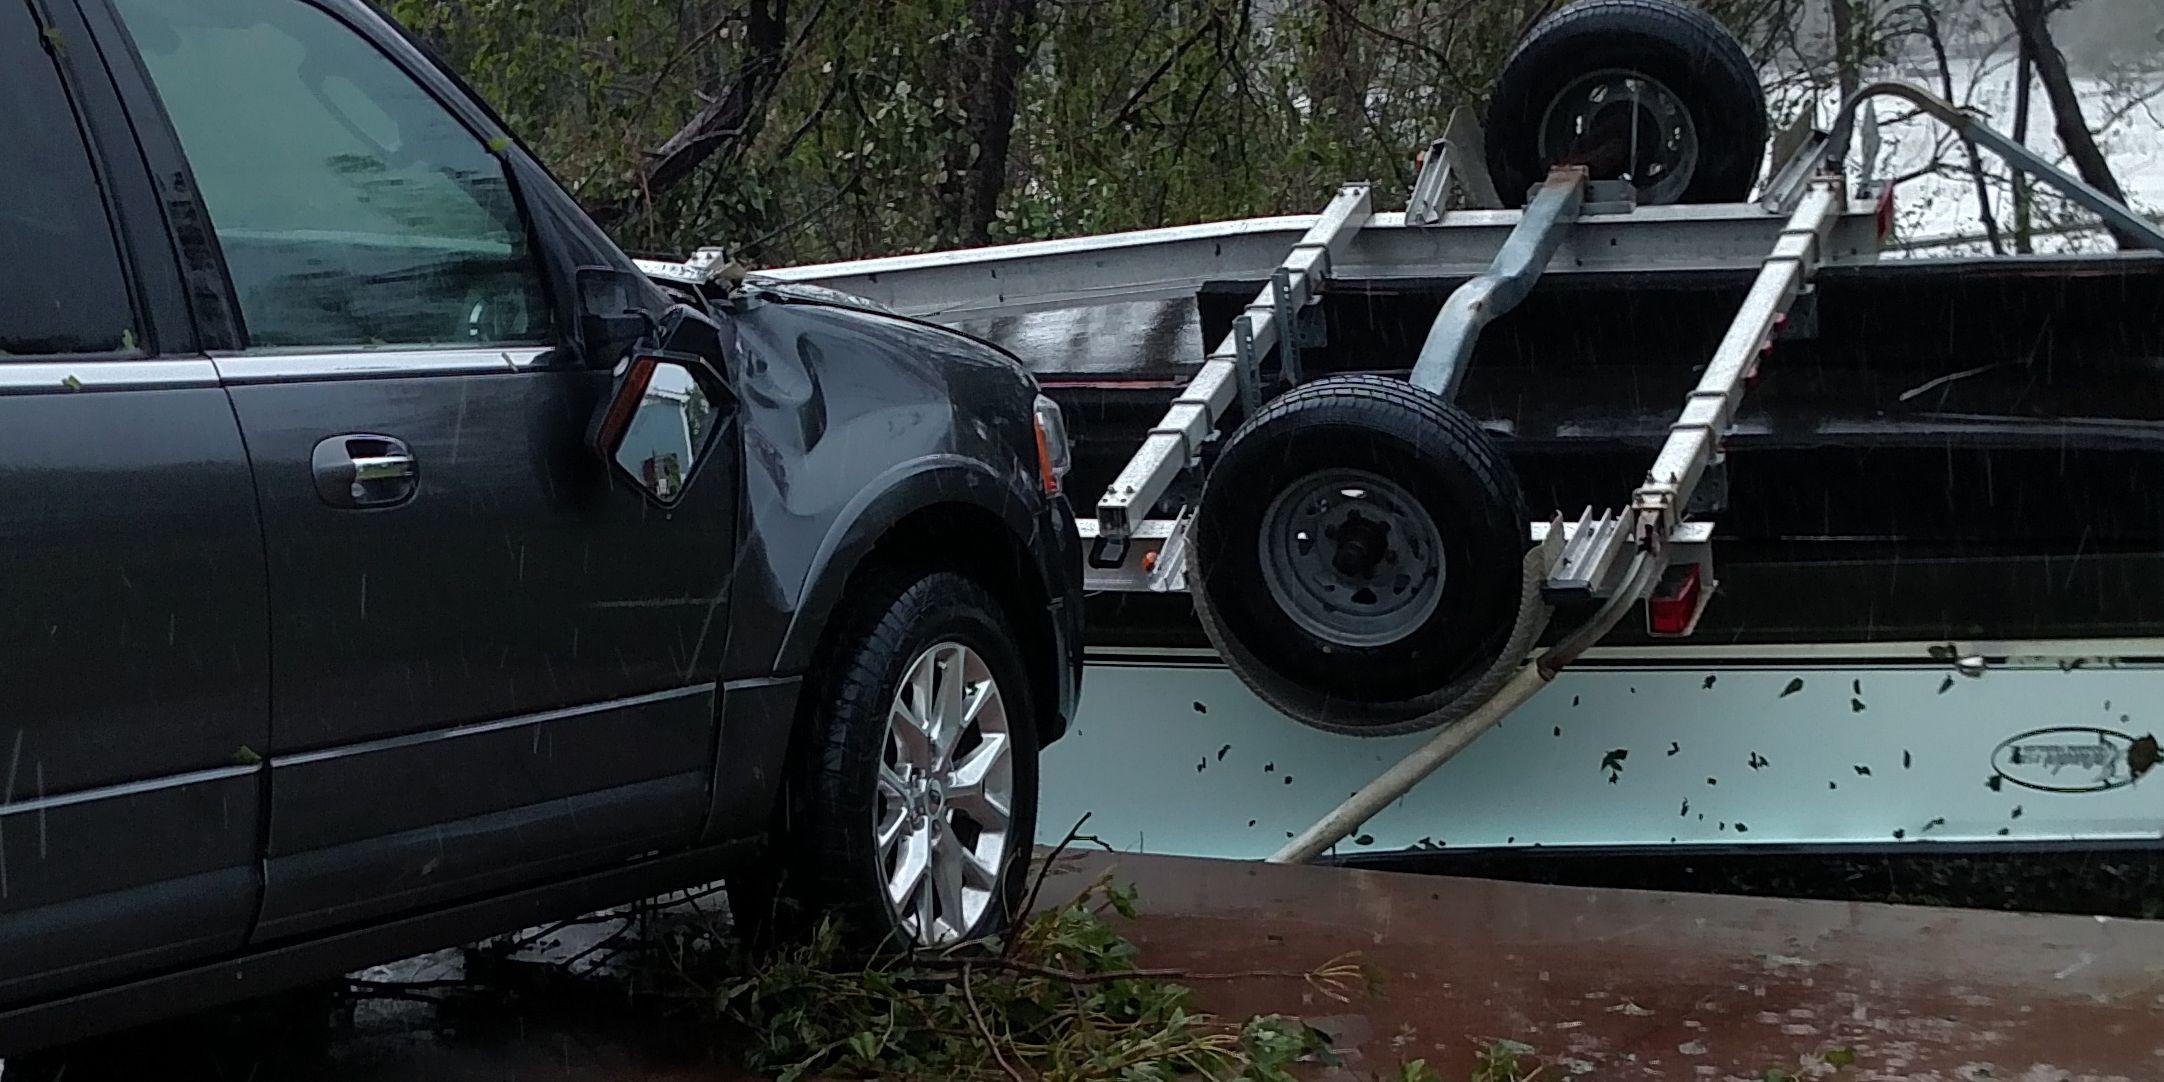 Confirmed tornado flips boat dock during Hurricane Florence